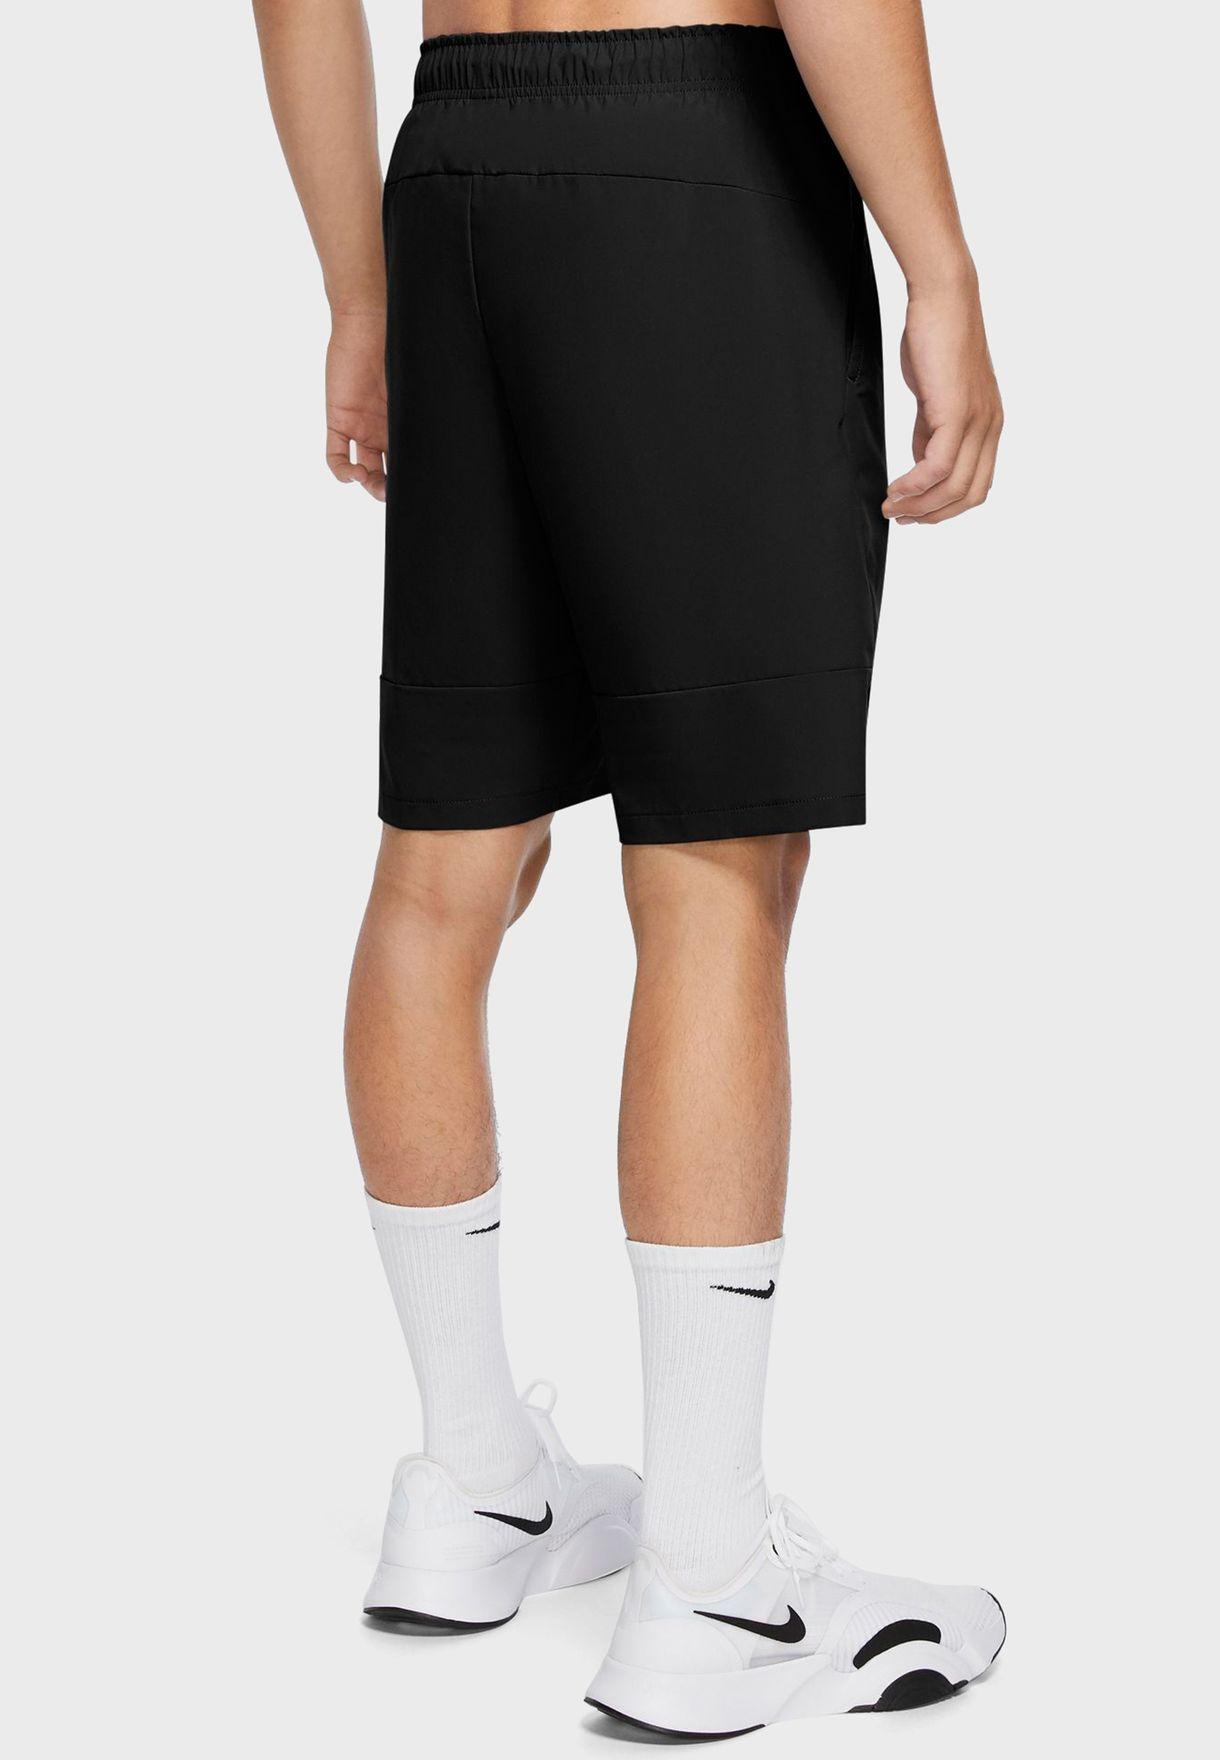 Dri-FIT Flex Woven Shorts